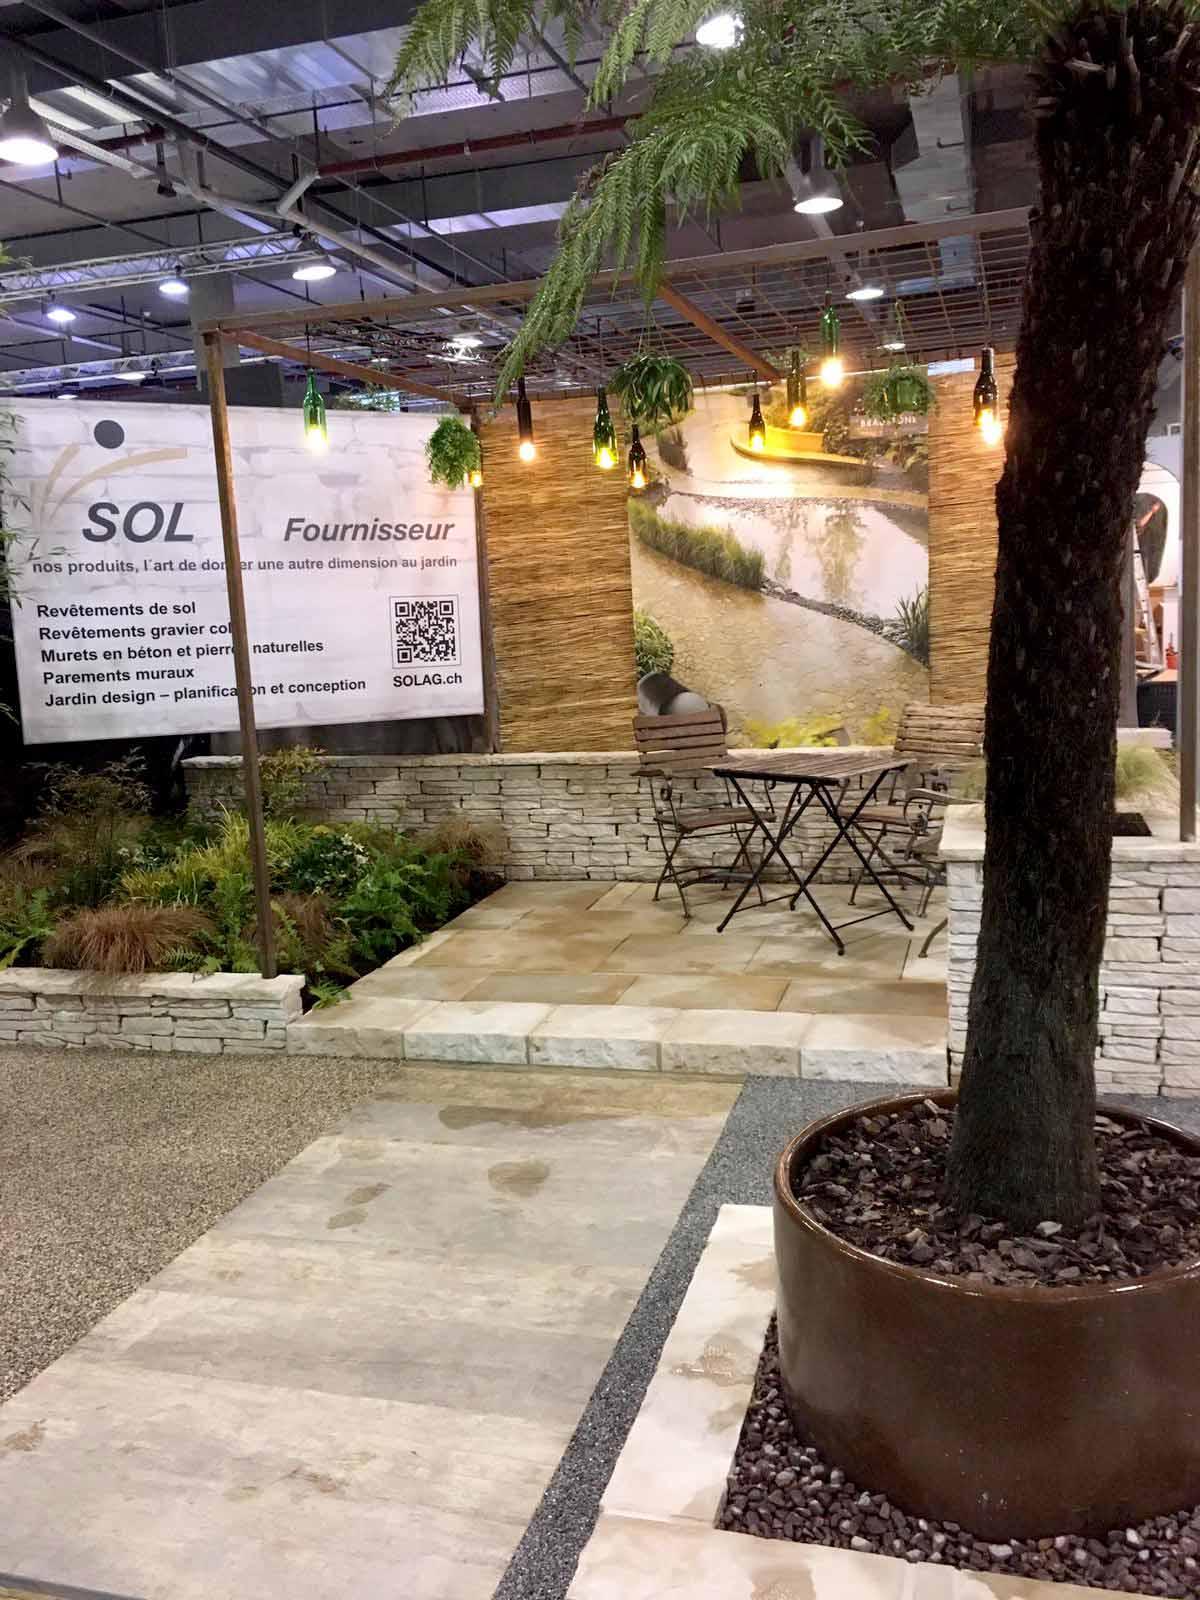 Habitat et Jardin 2019 in Lausanne - SOL AG